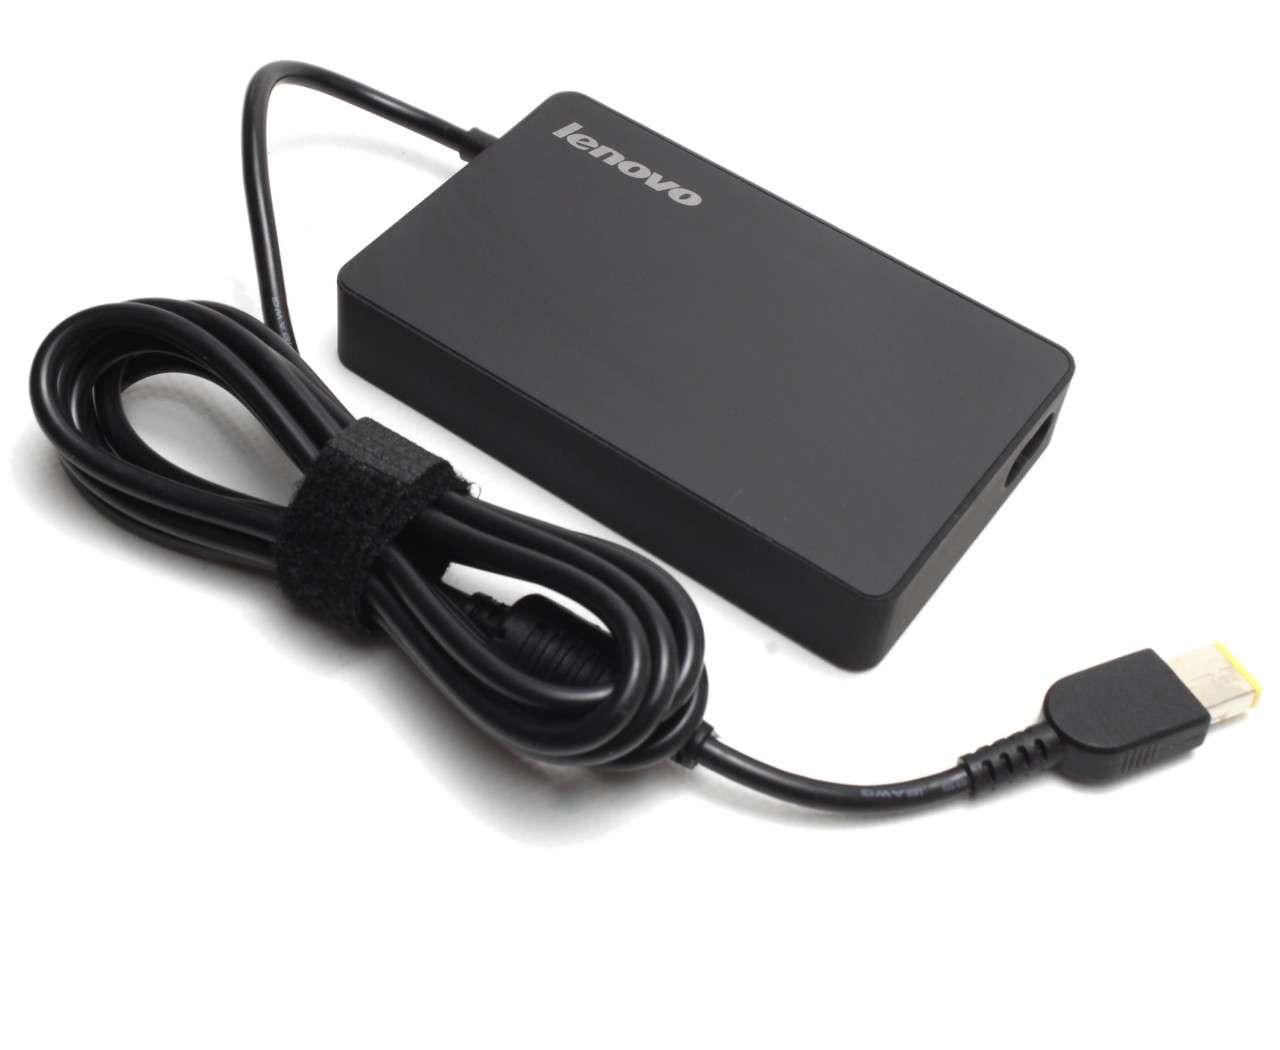 Incarcator Lenovo ThinkPad Edge E550c 65W Slim Version imagine